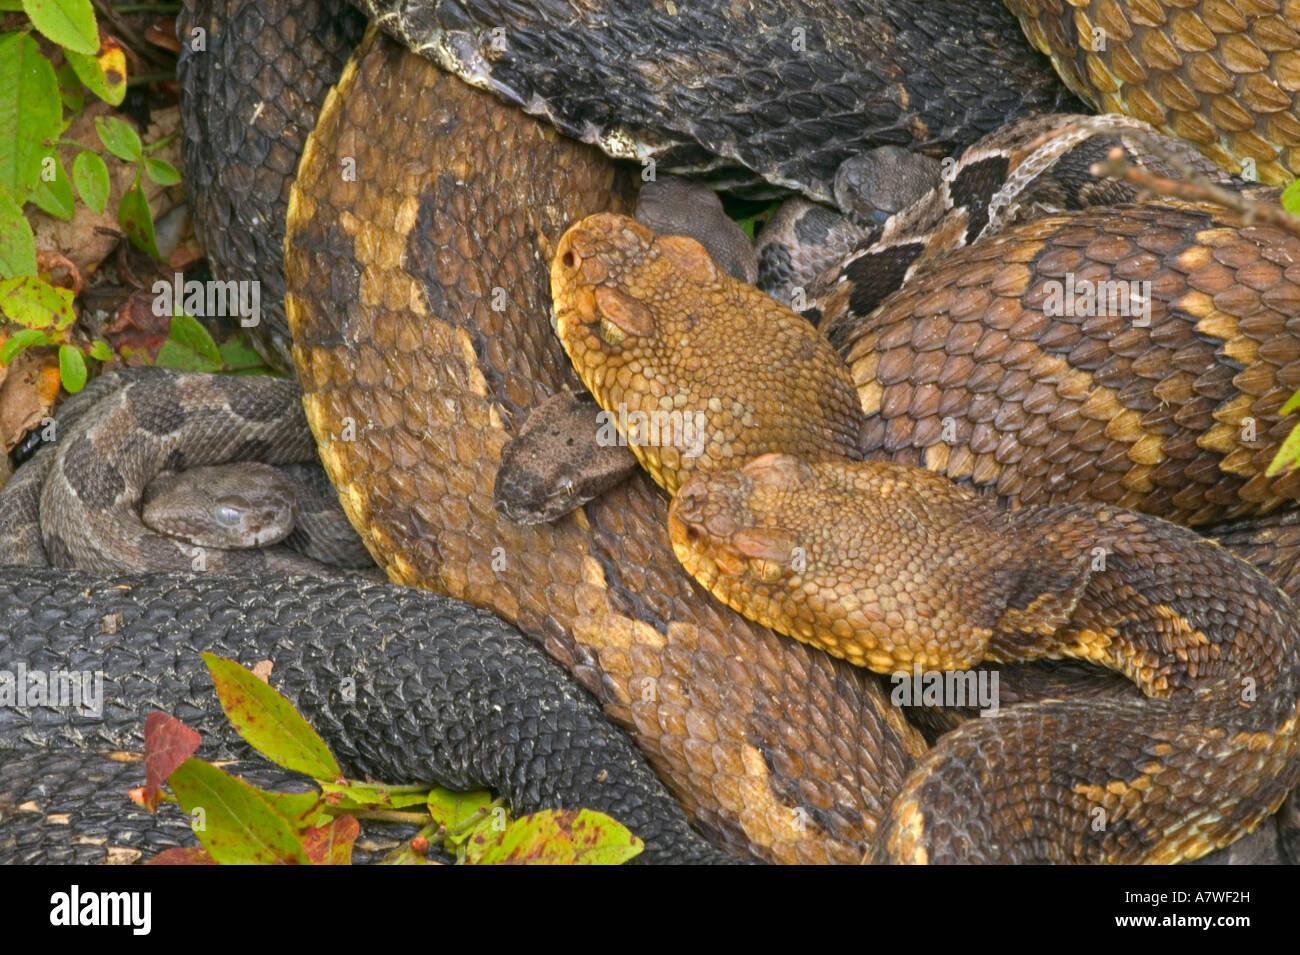 Holz-Klapperschlangen, (Crotalus Horridus), Pennsylvania, Erwachsene Female(s) und Neugeborenen jungen Stockbild